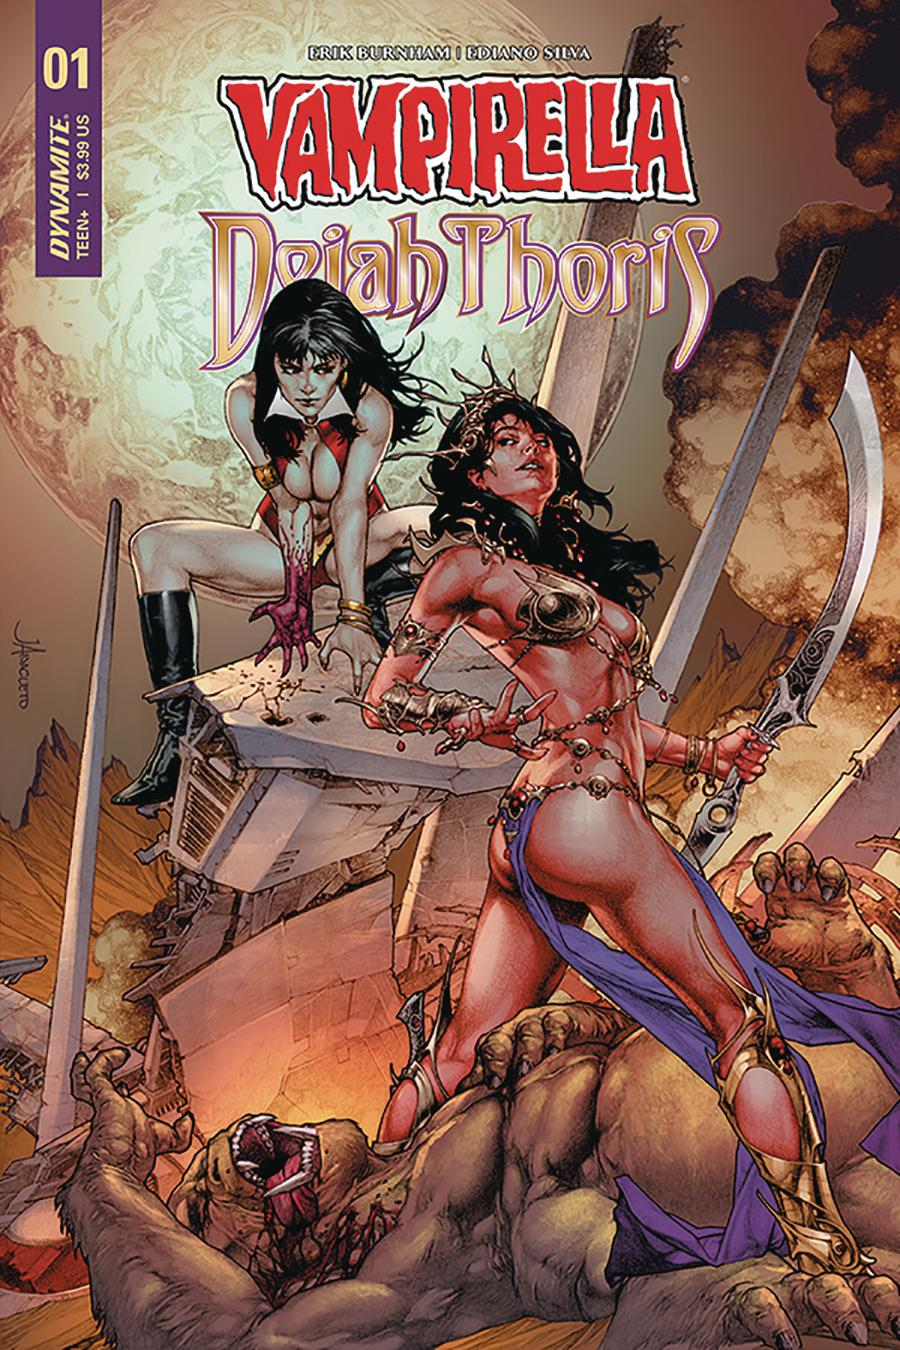 Vampirella Dejah Thoris #1 Cover A Regular Jay Anacleto Cover